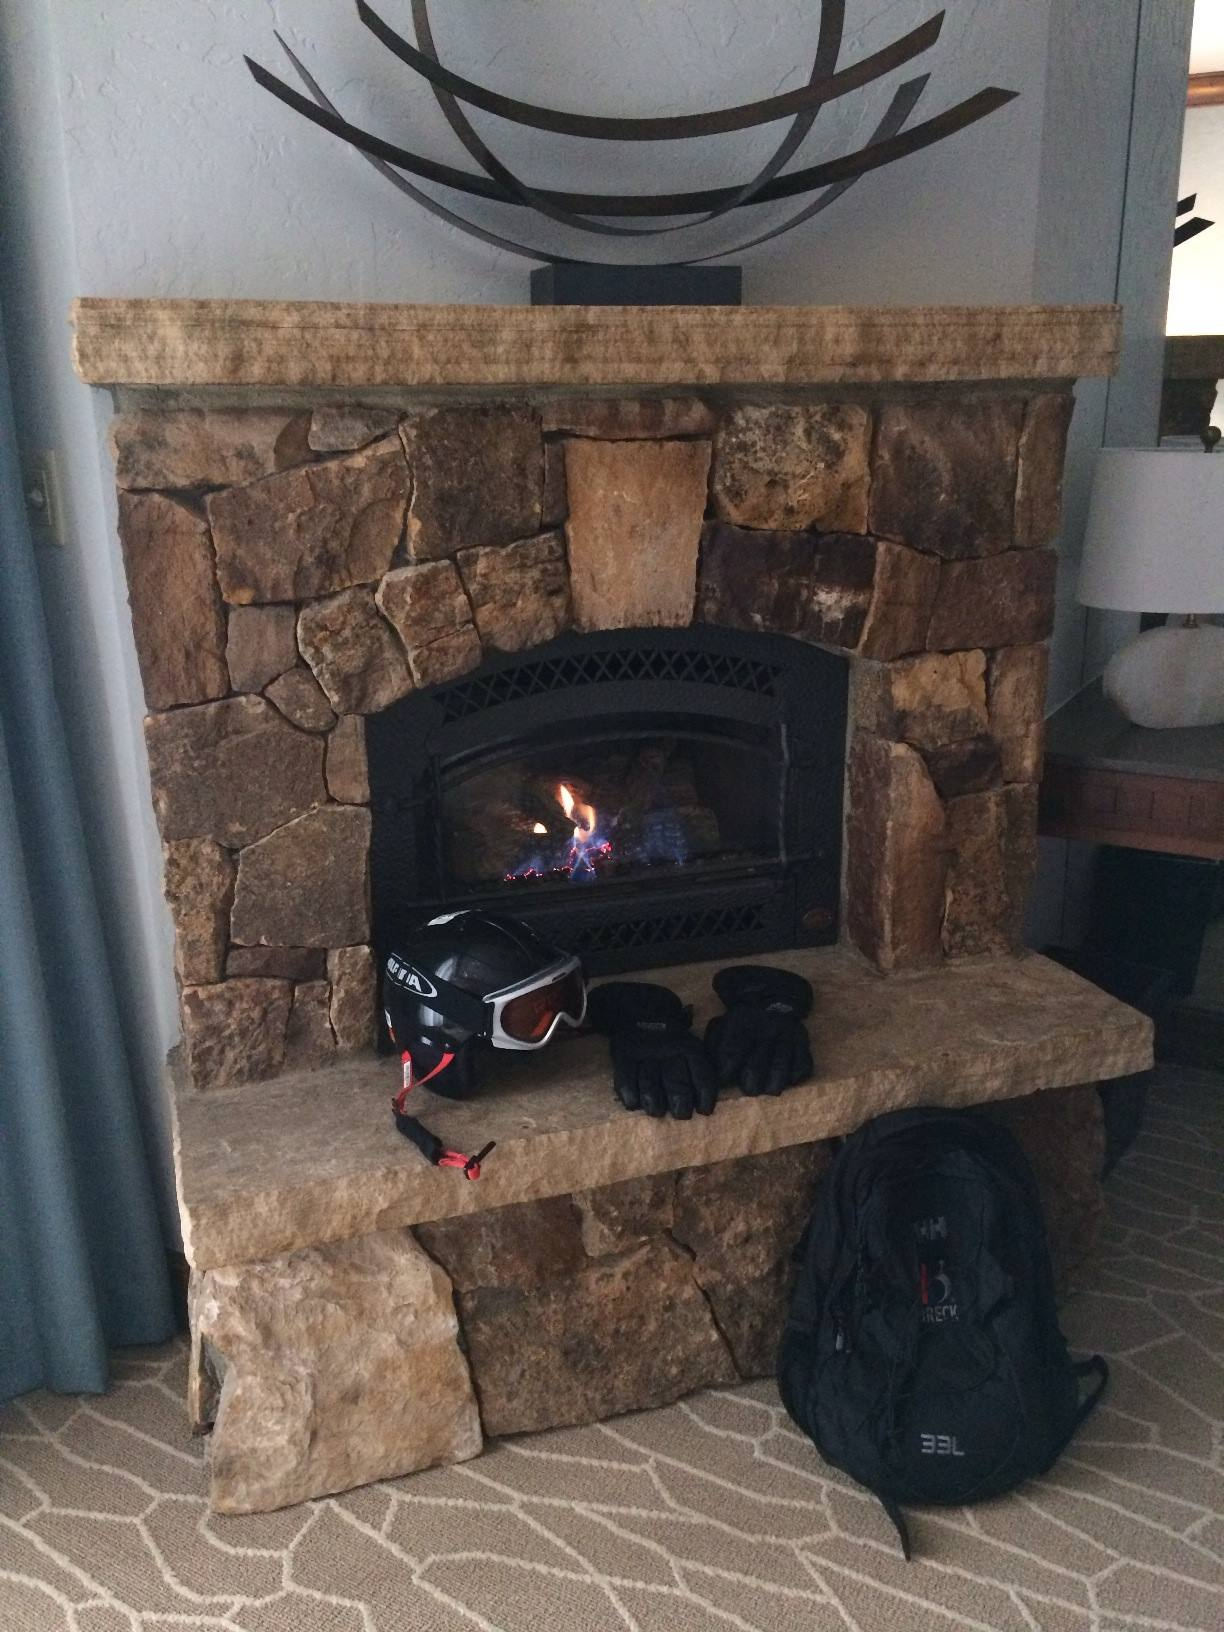 USA Skireise. Beaver Creek und Vail, Colorado. winterurlaub usa schnee land und leute familie karibik mittelamerika  tui belrin colorado beaver creek amerika kamin